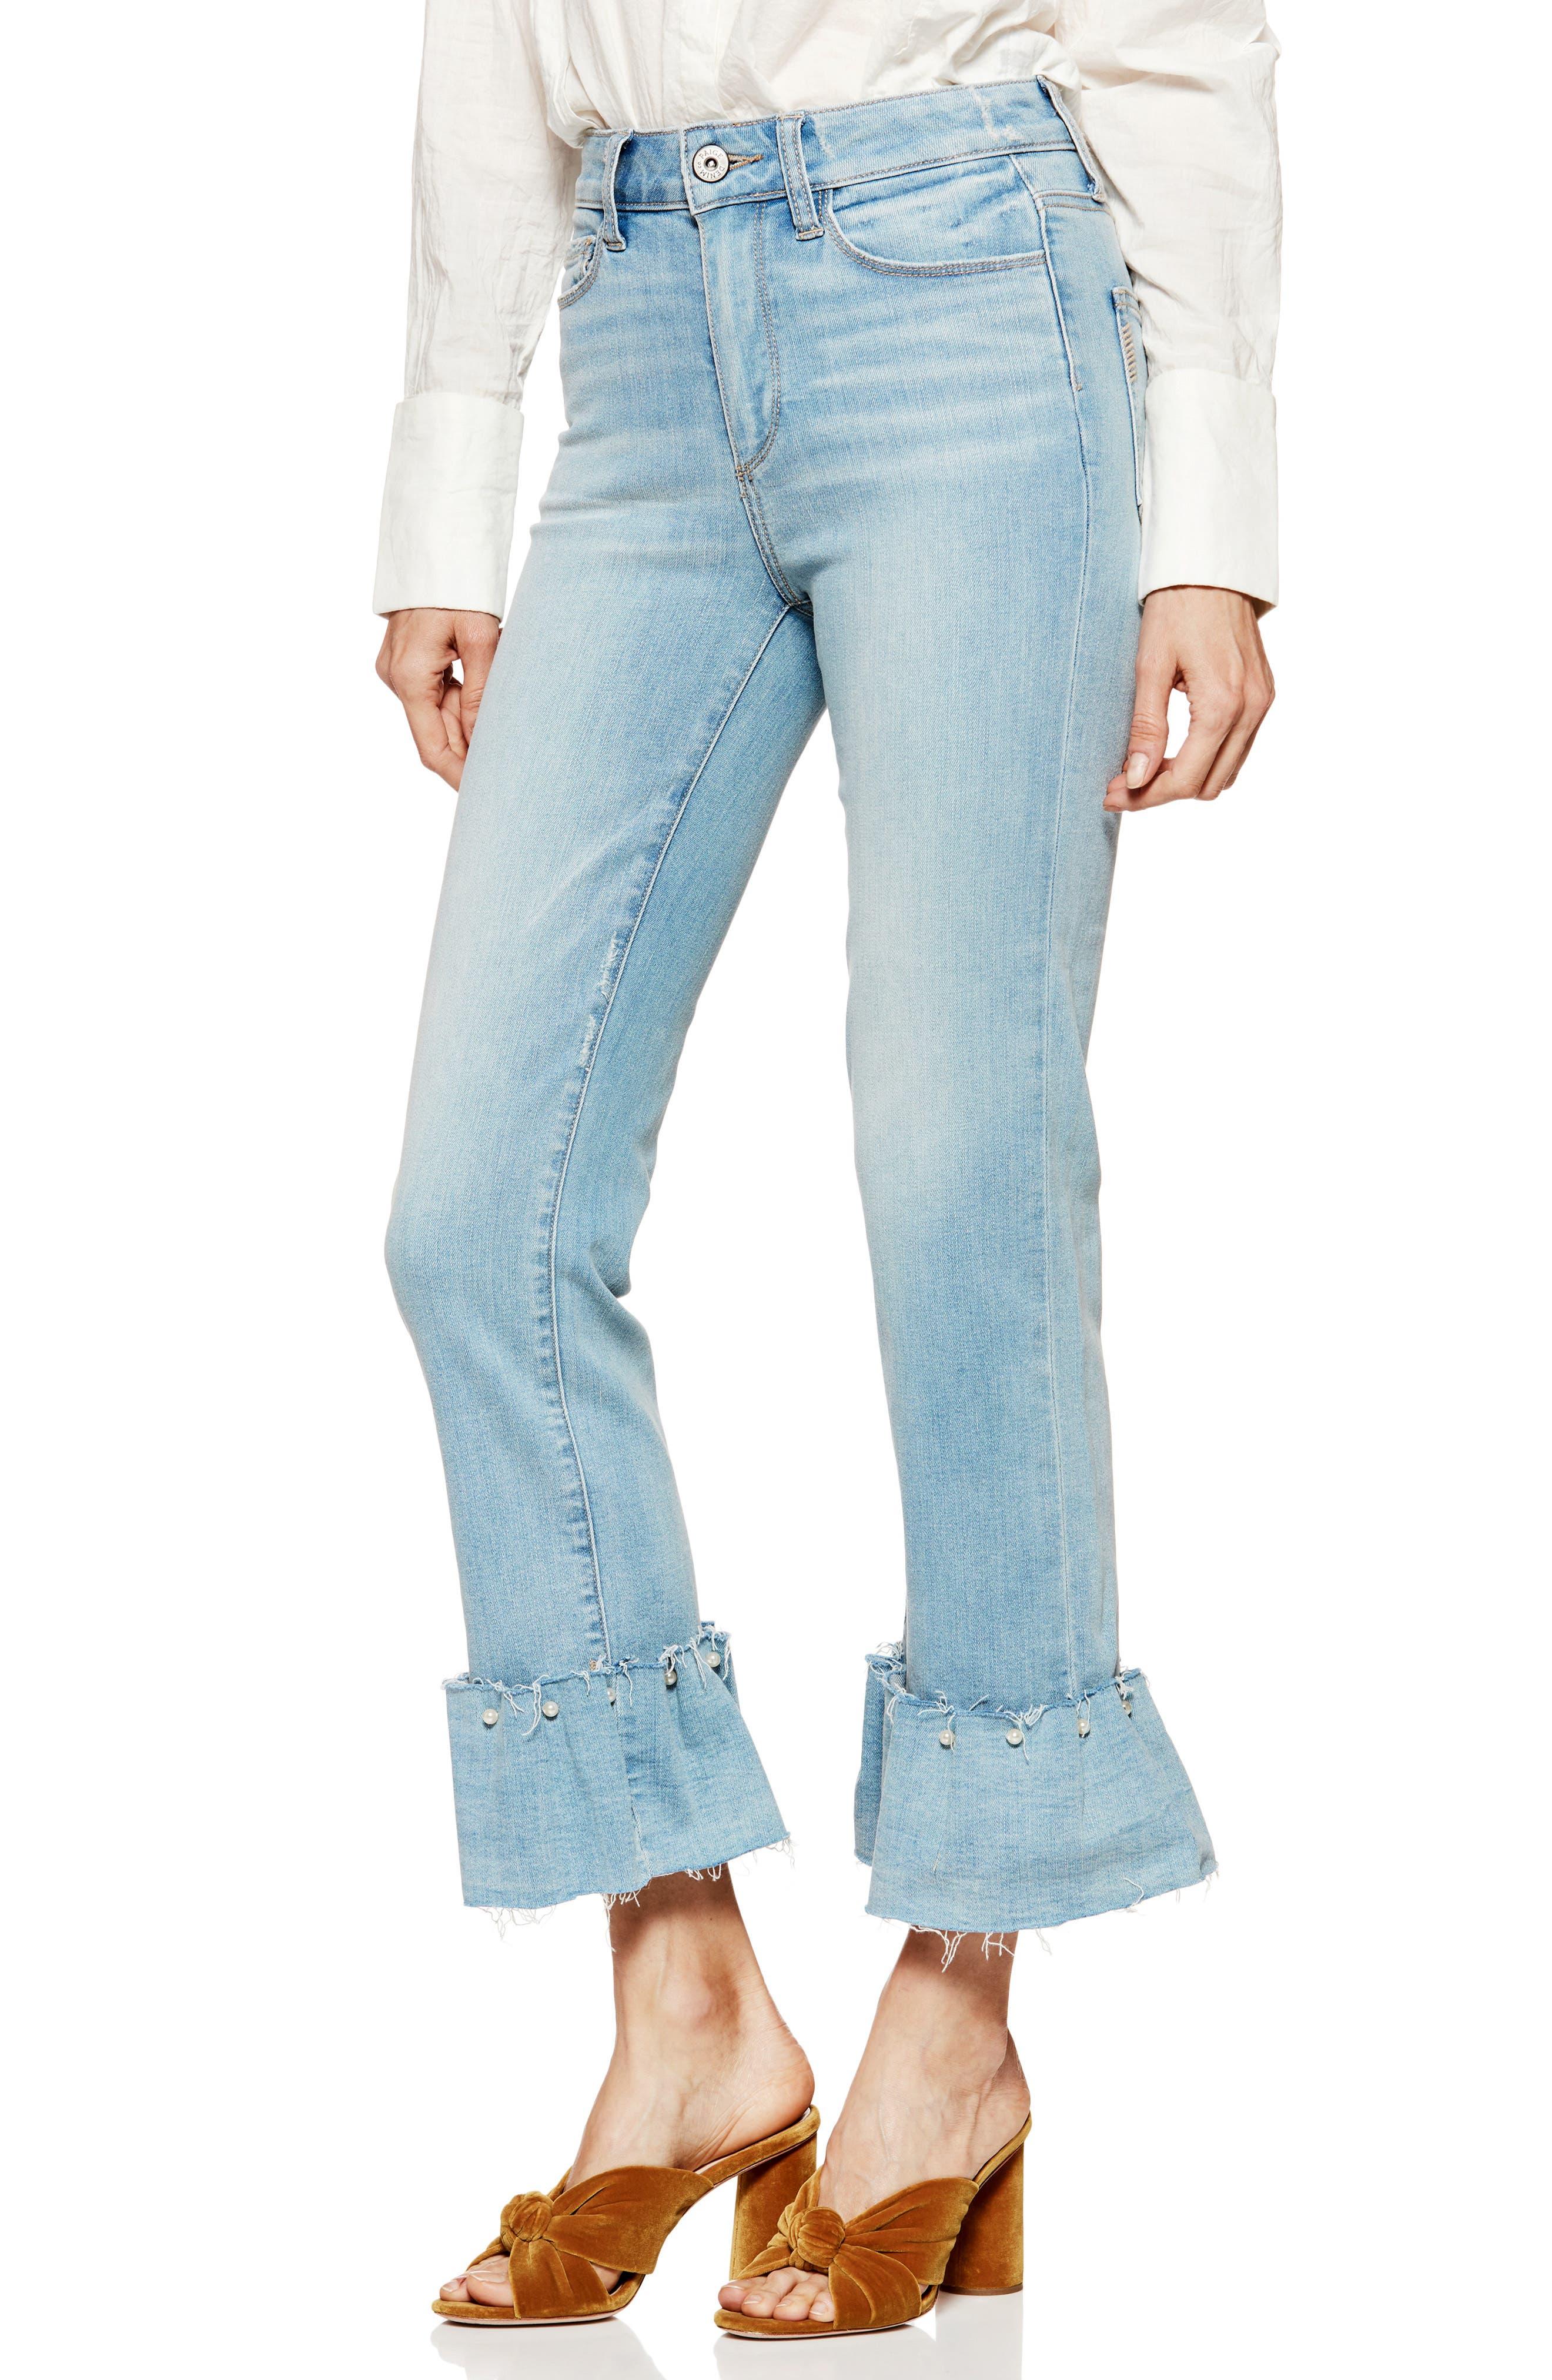 Transcend Vintage - Hoxton Embellished Ruffle High Waist Jeans,                         Main,                         color, Palms